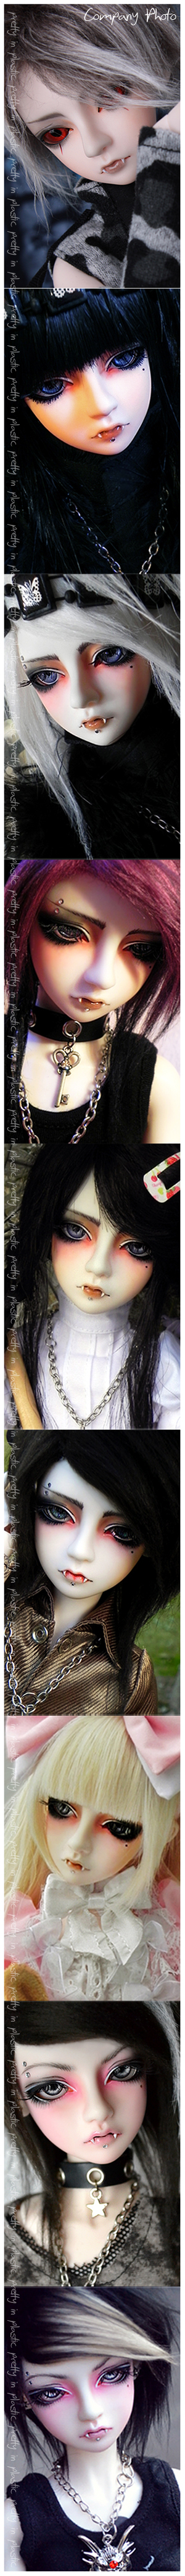 Single Doll Changes Meme: Raphael by prettyinplastic